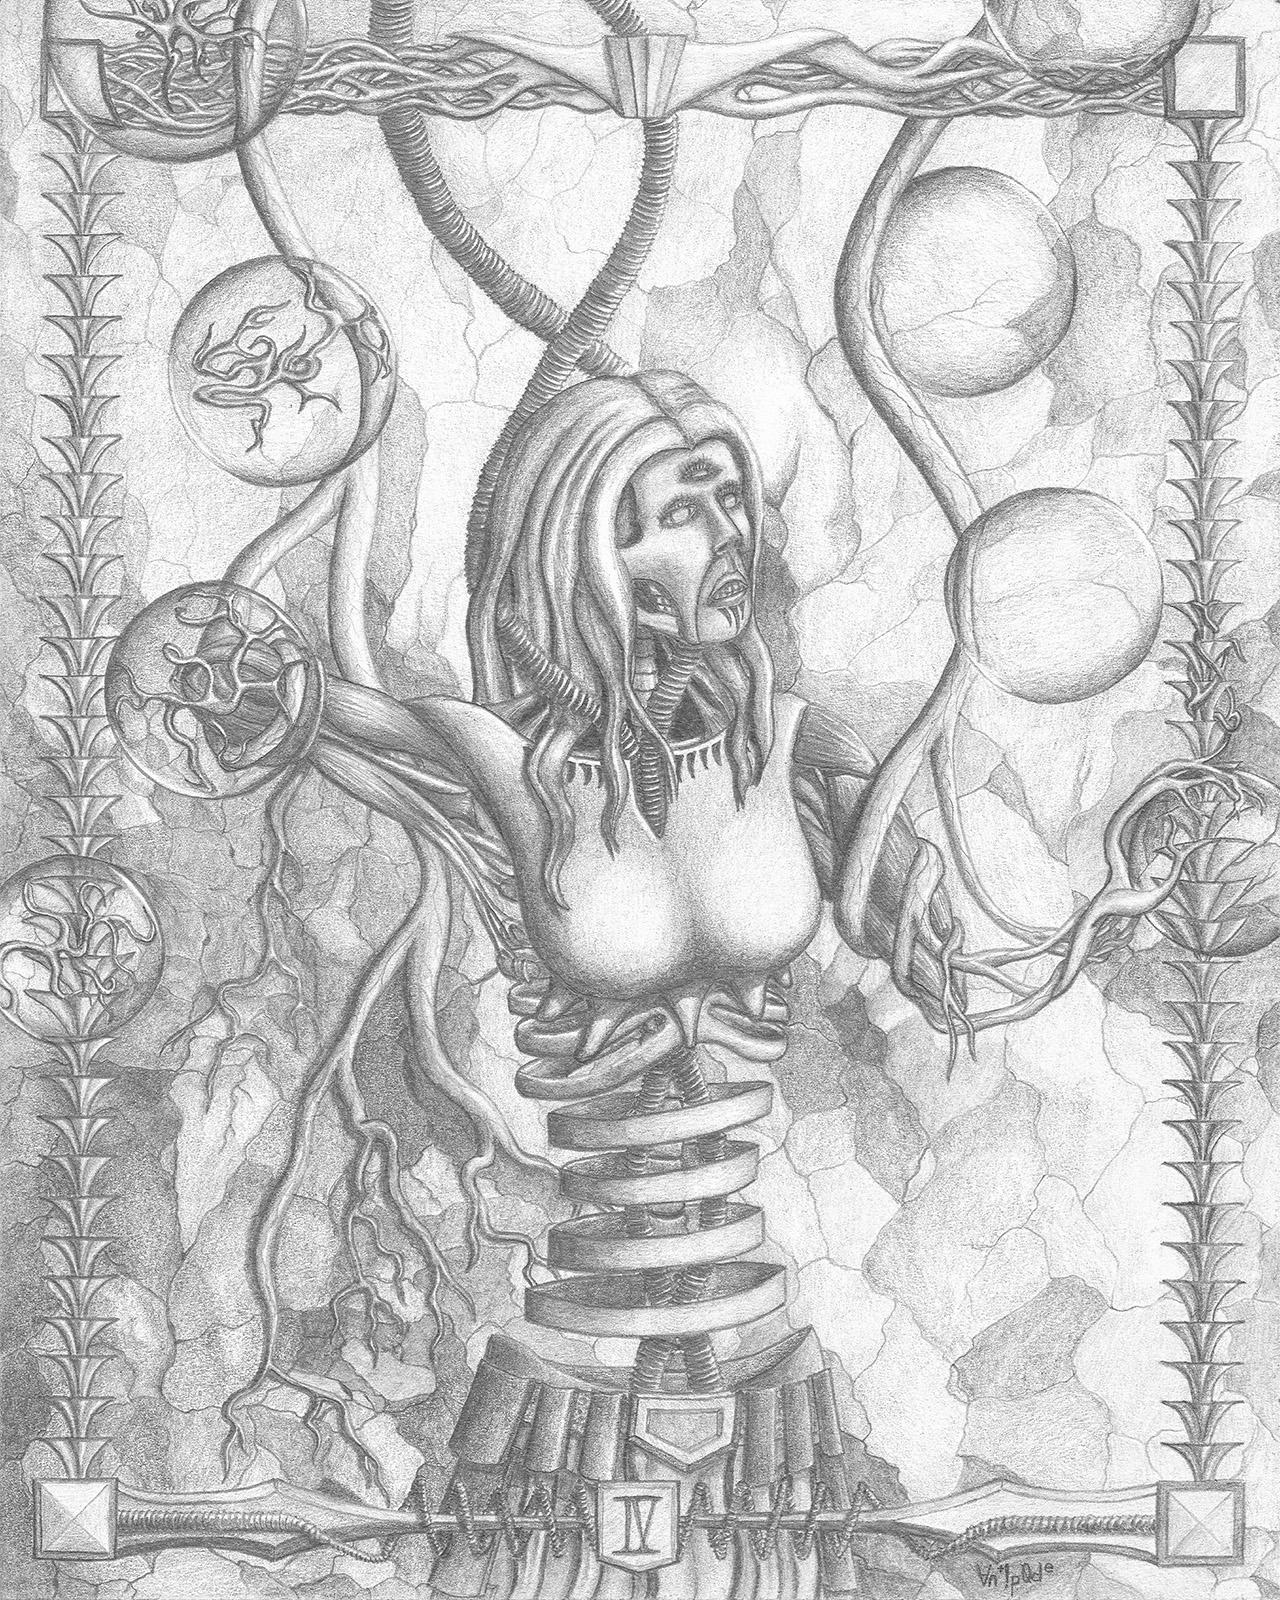 "IV, graphite on paper, 8x10"", 2015"